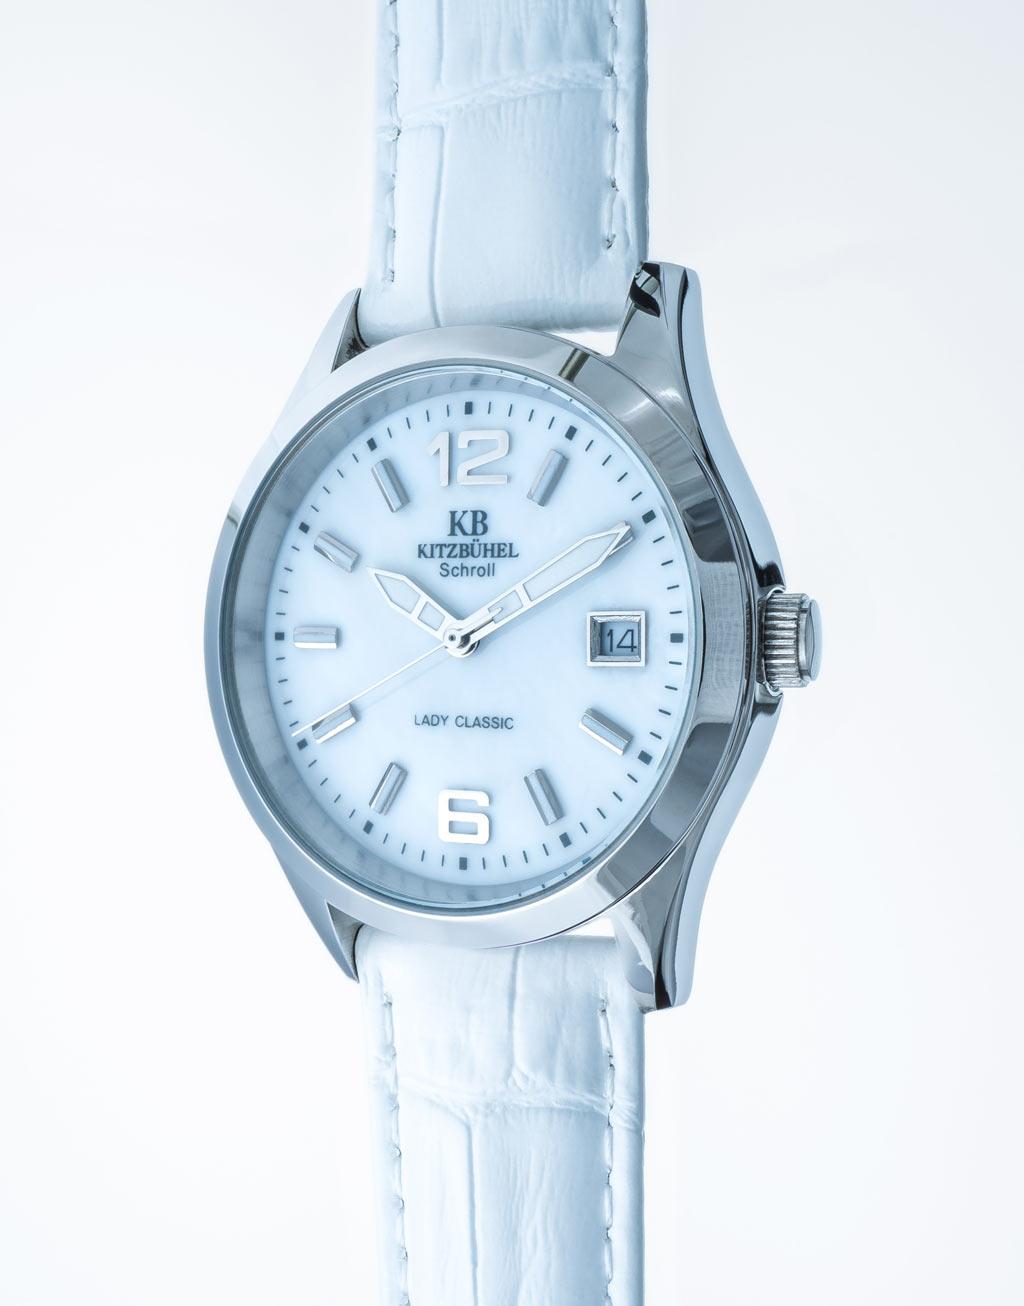 KB Watch – Lady Classic